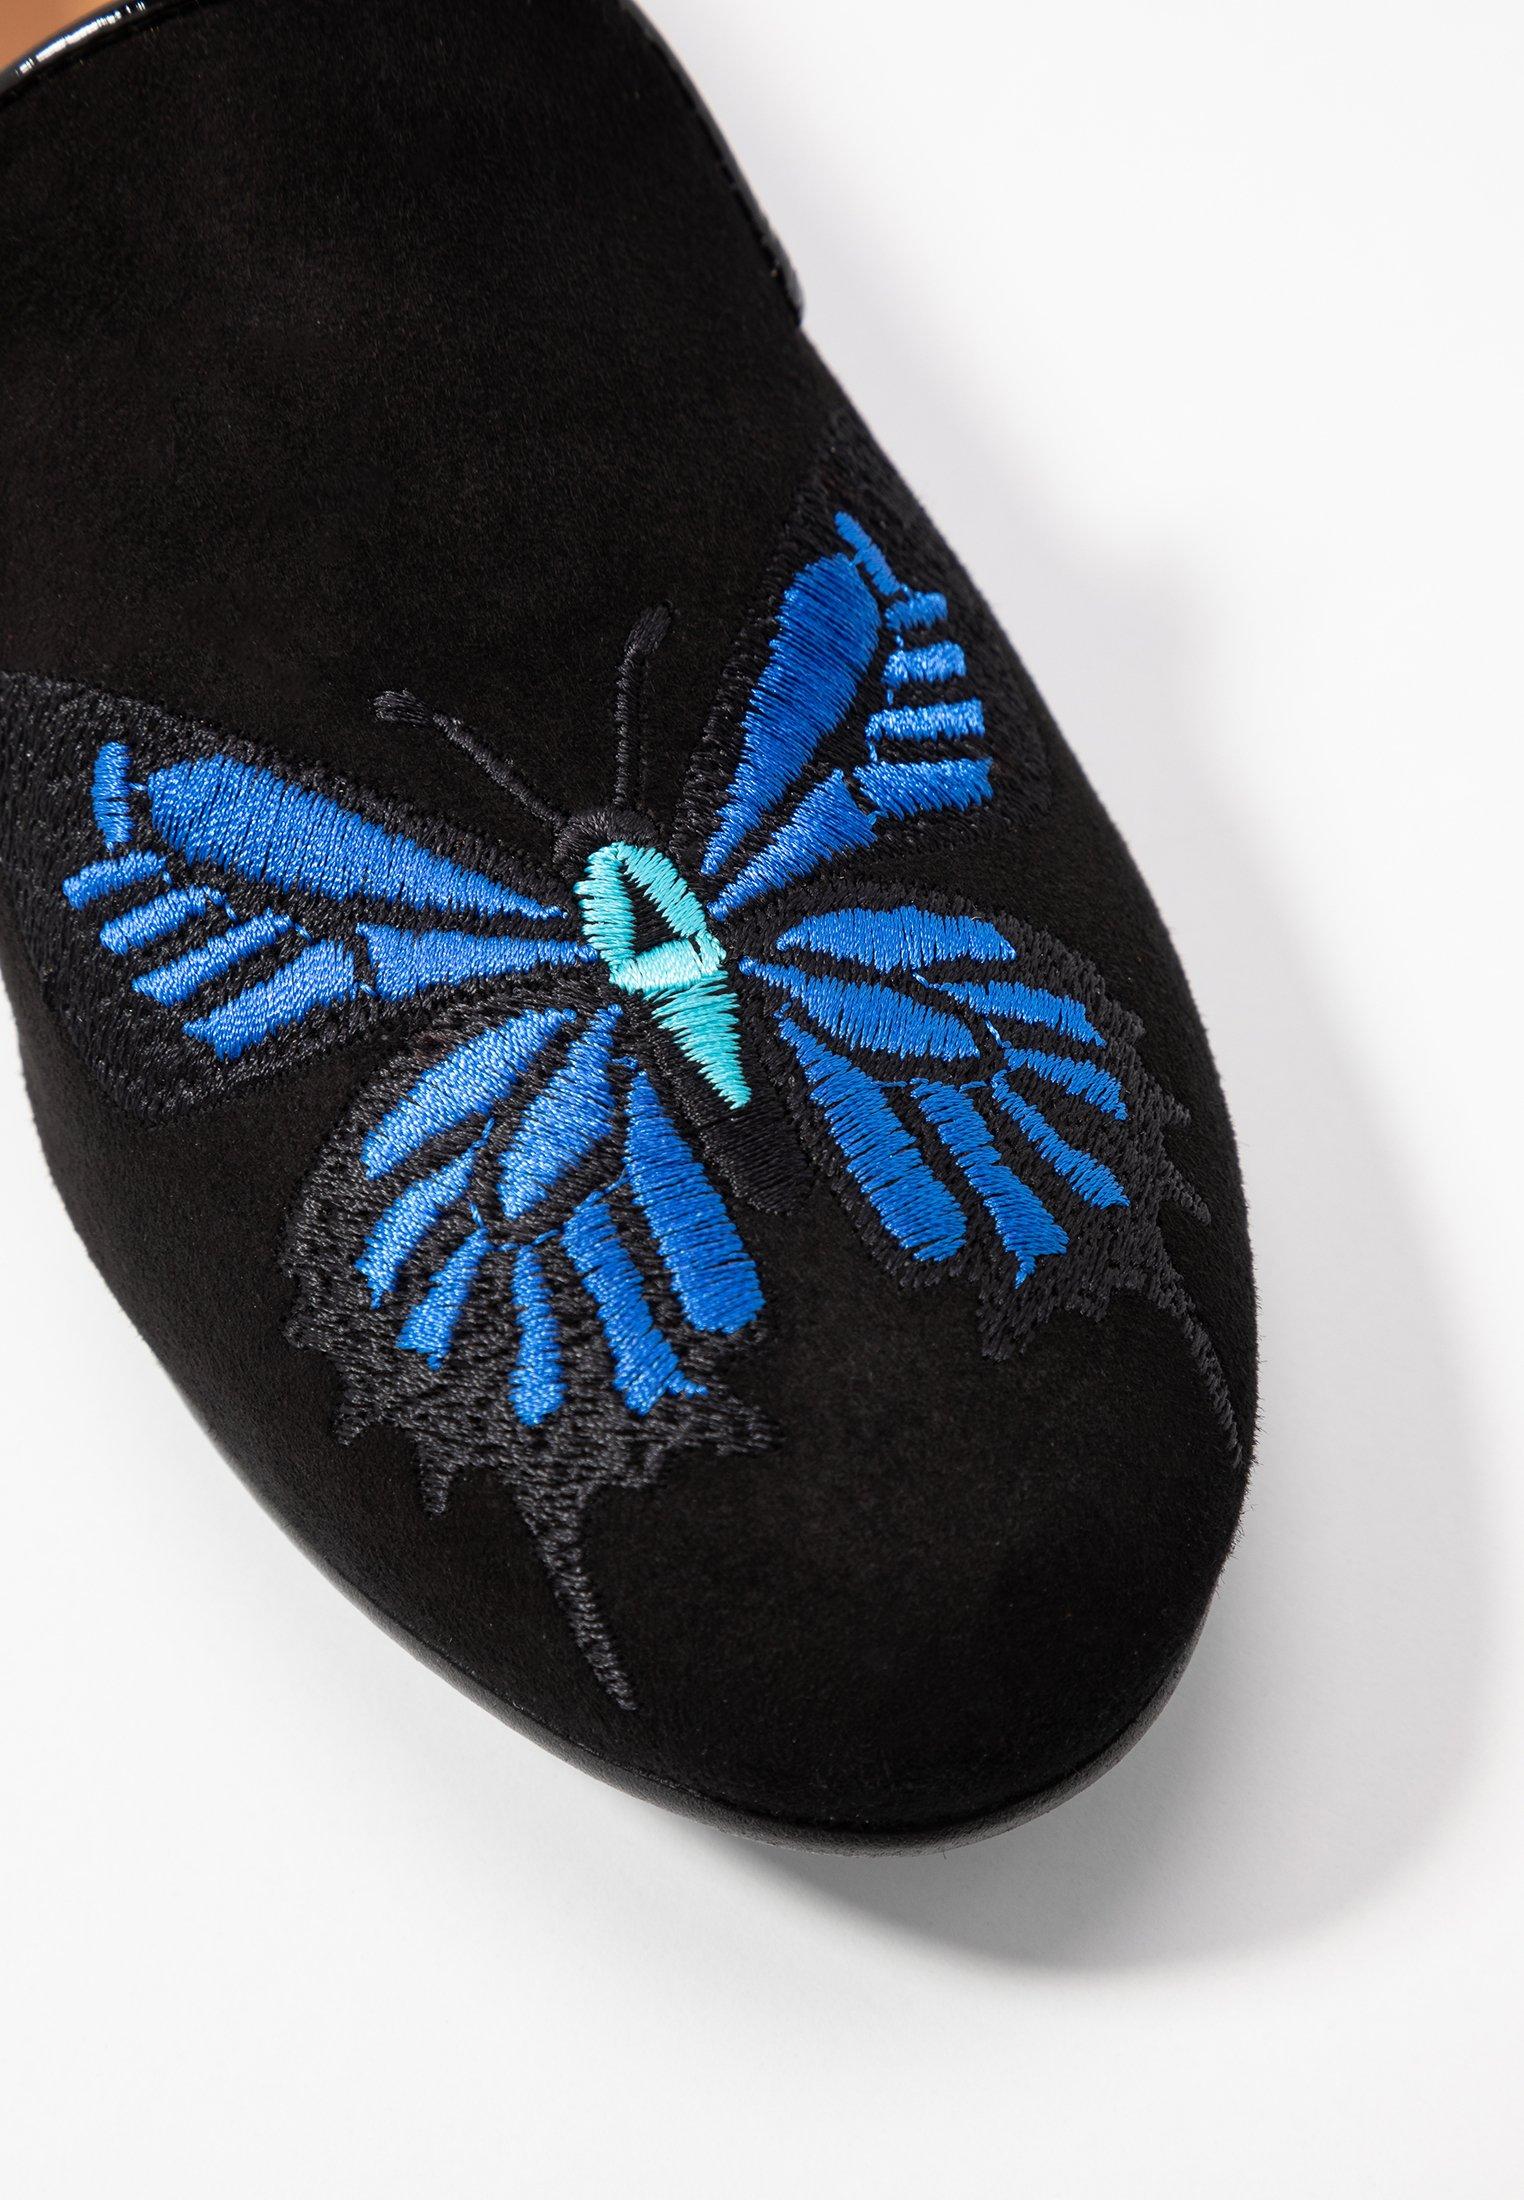 ClientMocassins Black ClientMocassins Butterfly Chatelles ClientMocassins Chatelles Black Chatelles Black Butterfly Chatelles Butterfly shdBrxtQC